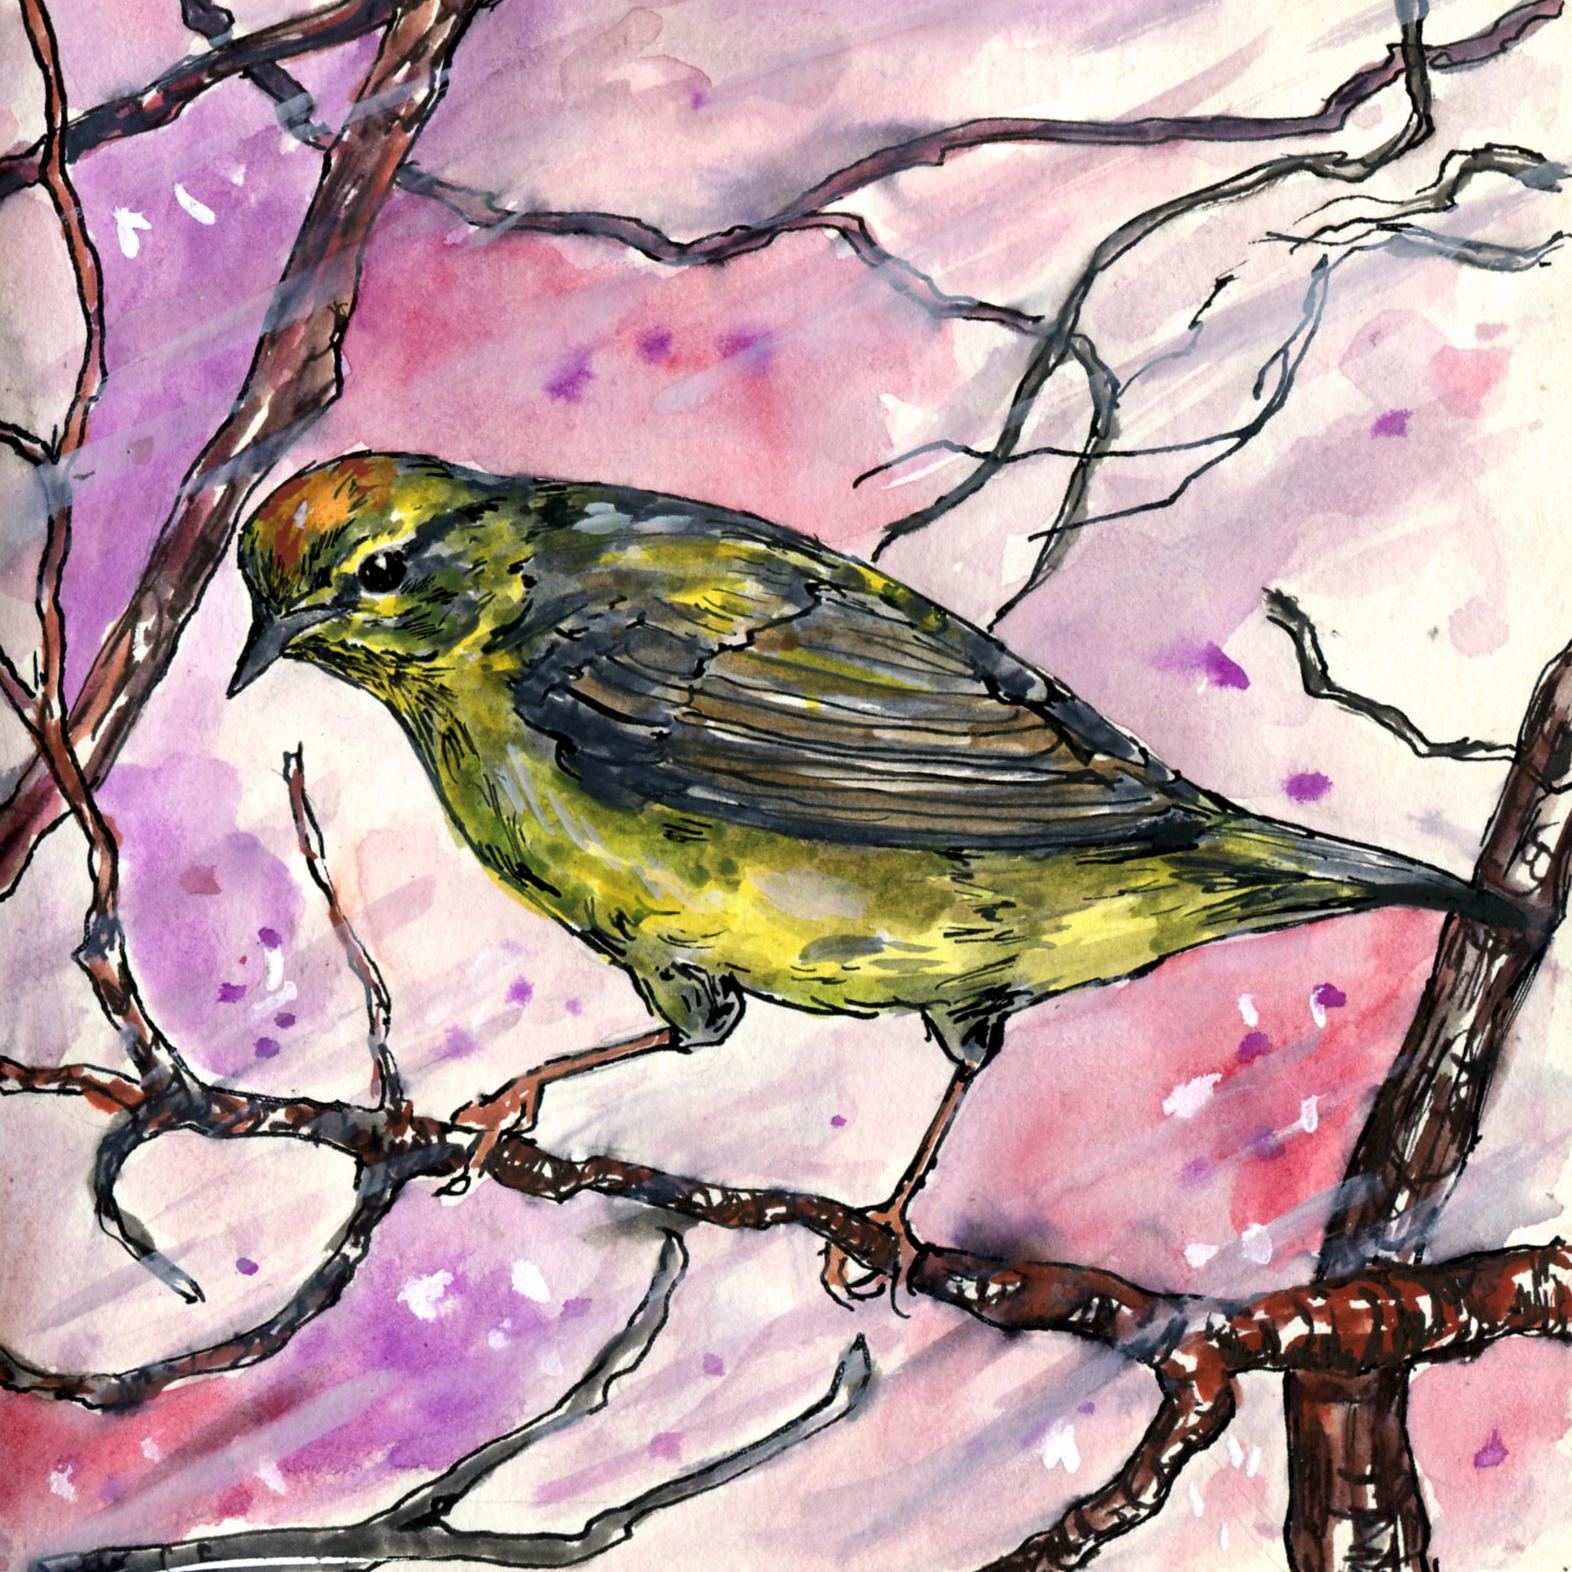 91. Orange-crowned Warbler